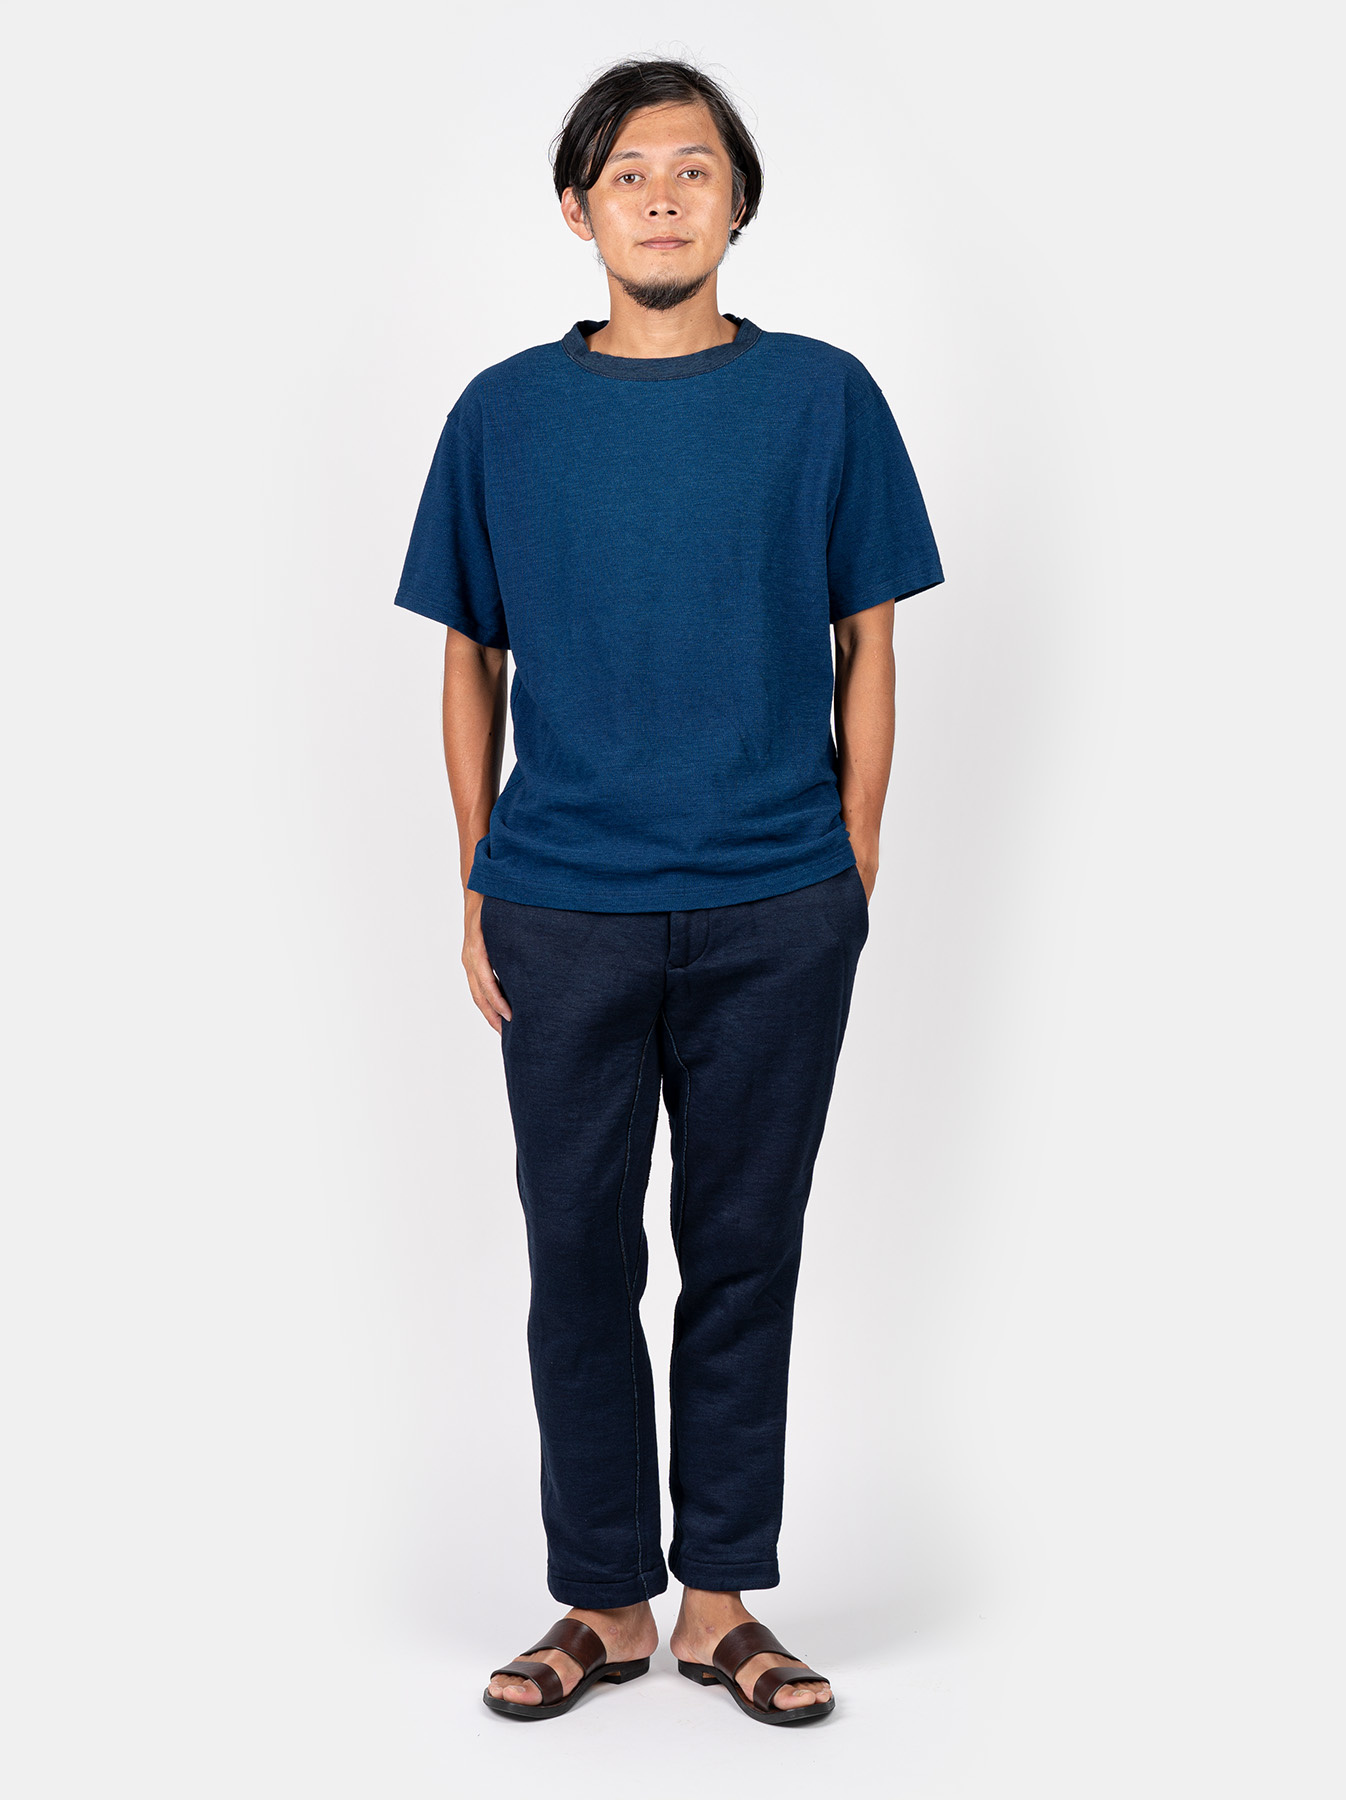 WH Indigo Ultimate Pique T-shirt Distressed-2